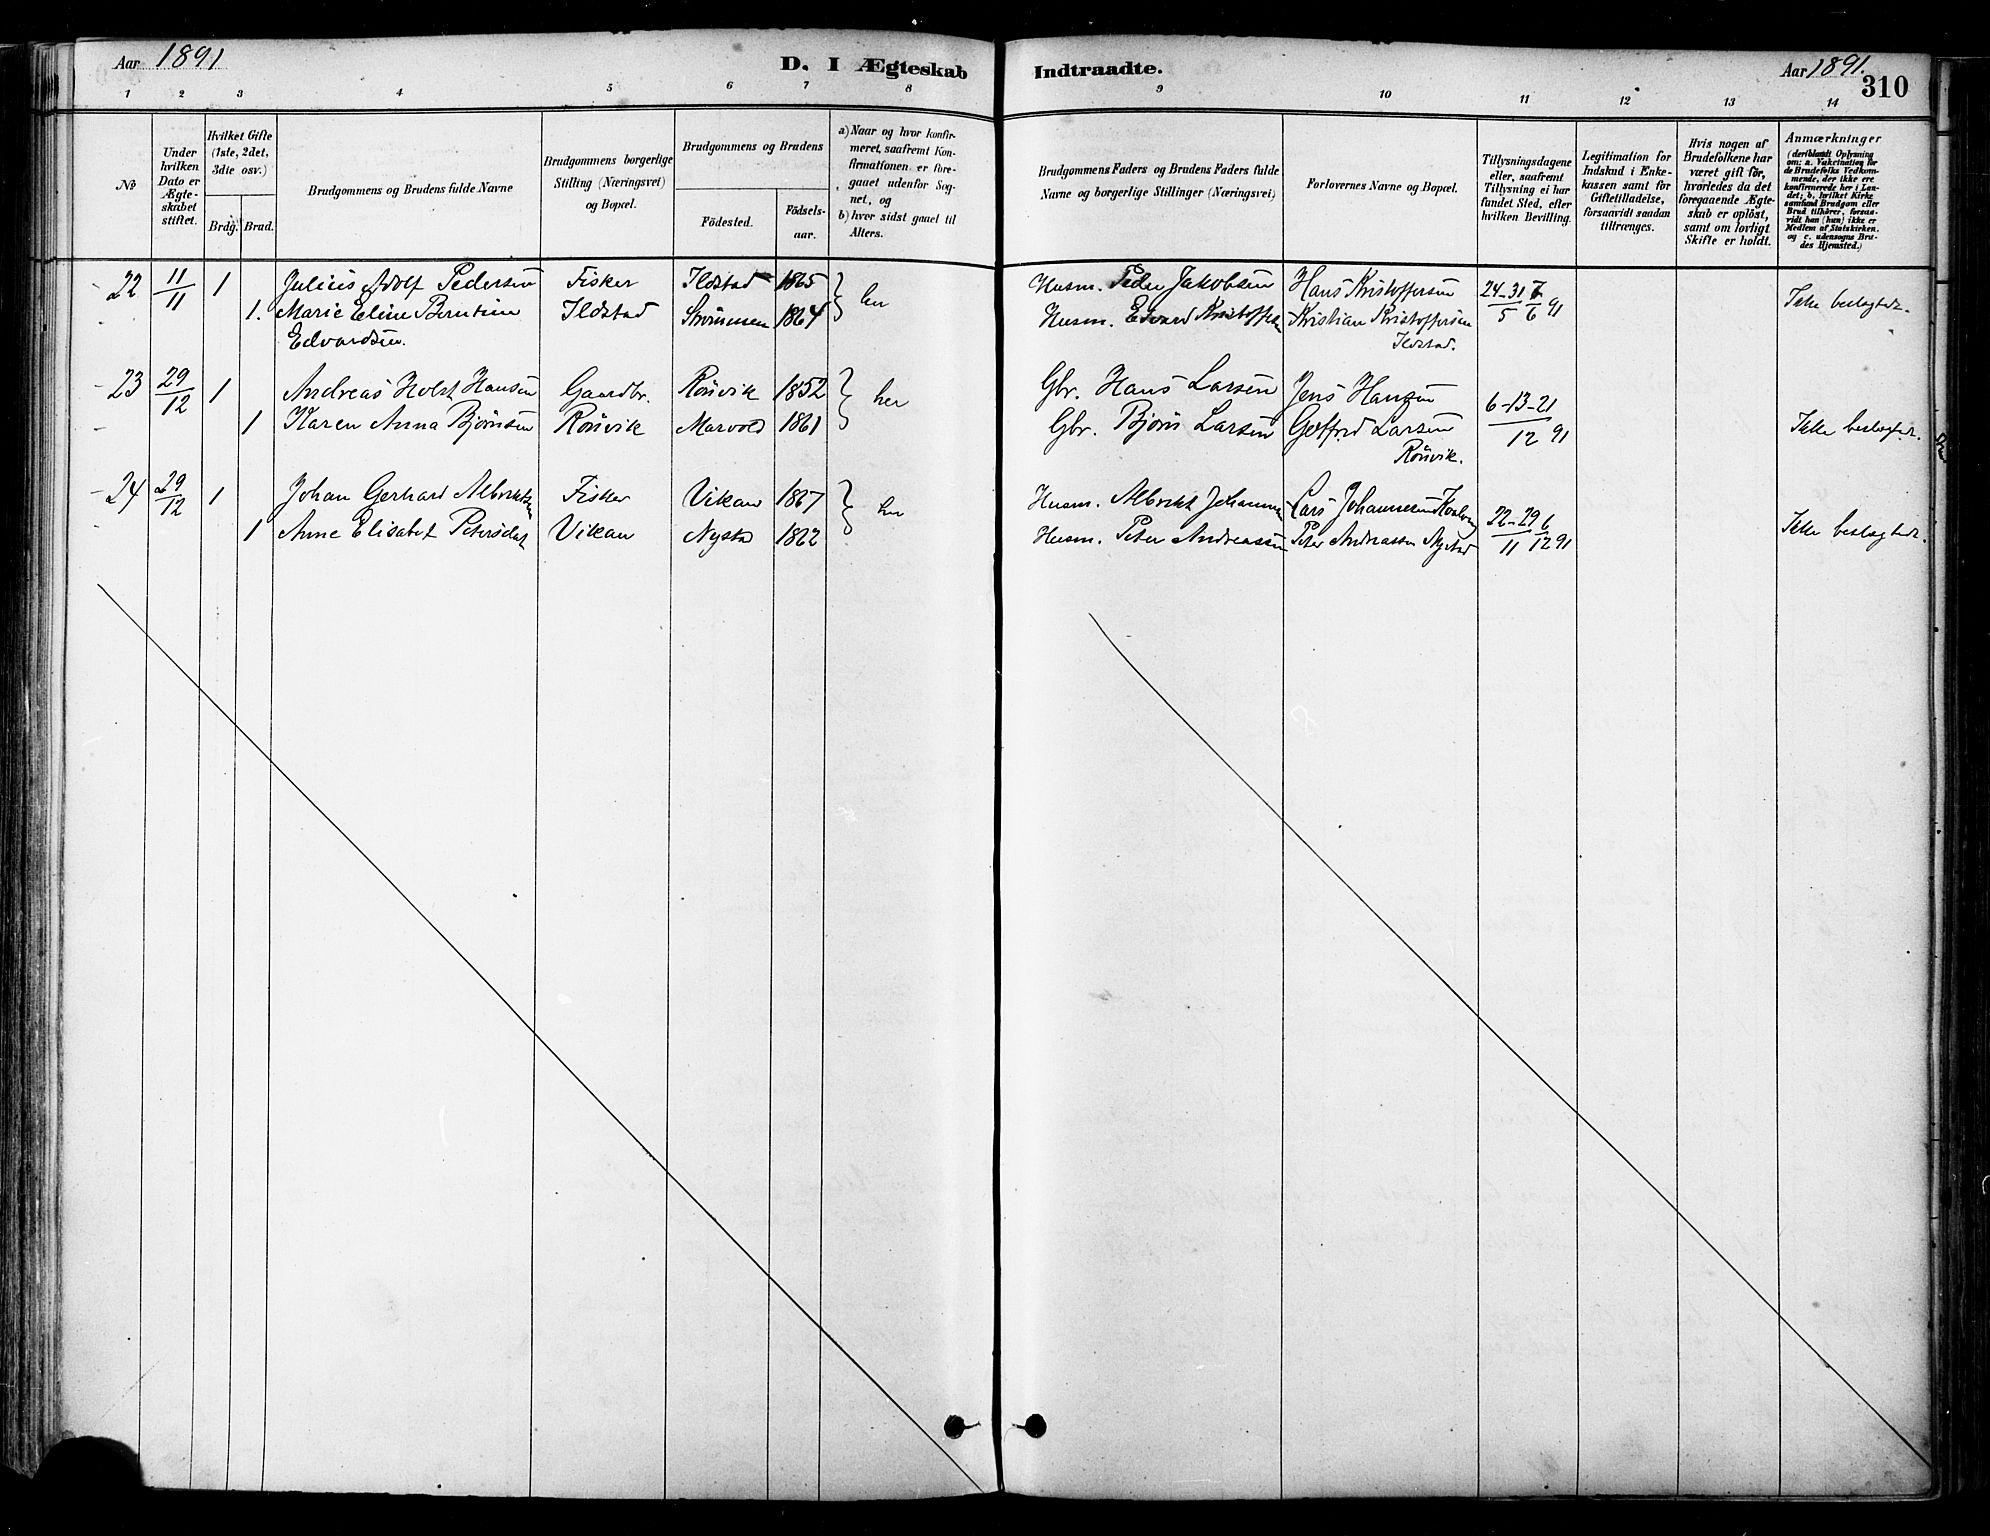 SAT, Ministerialprotokoller, klokkerbøker og fødselsregistre - Nordland, 802/L0054: Ministerialbok nr. 802A01, 1879-1893, s. 310